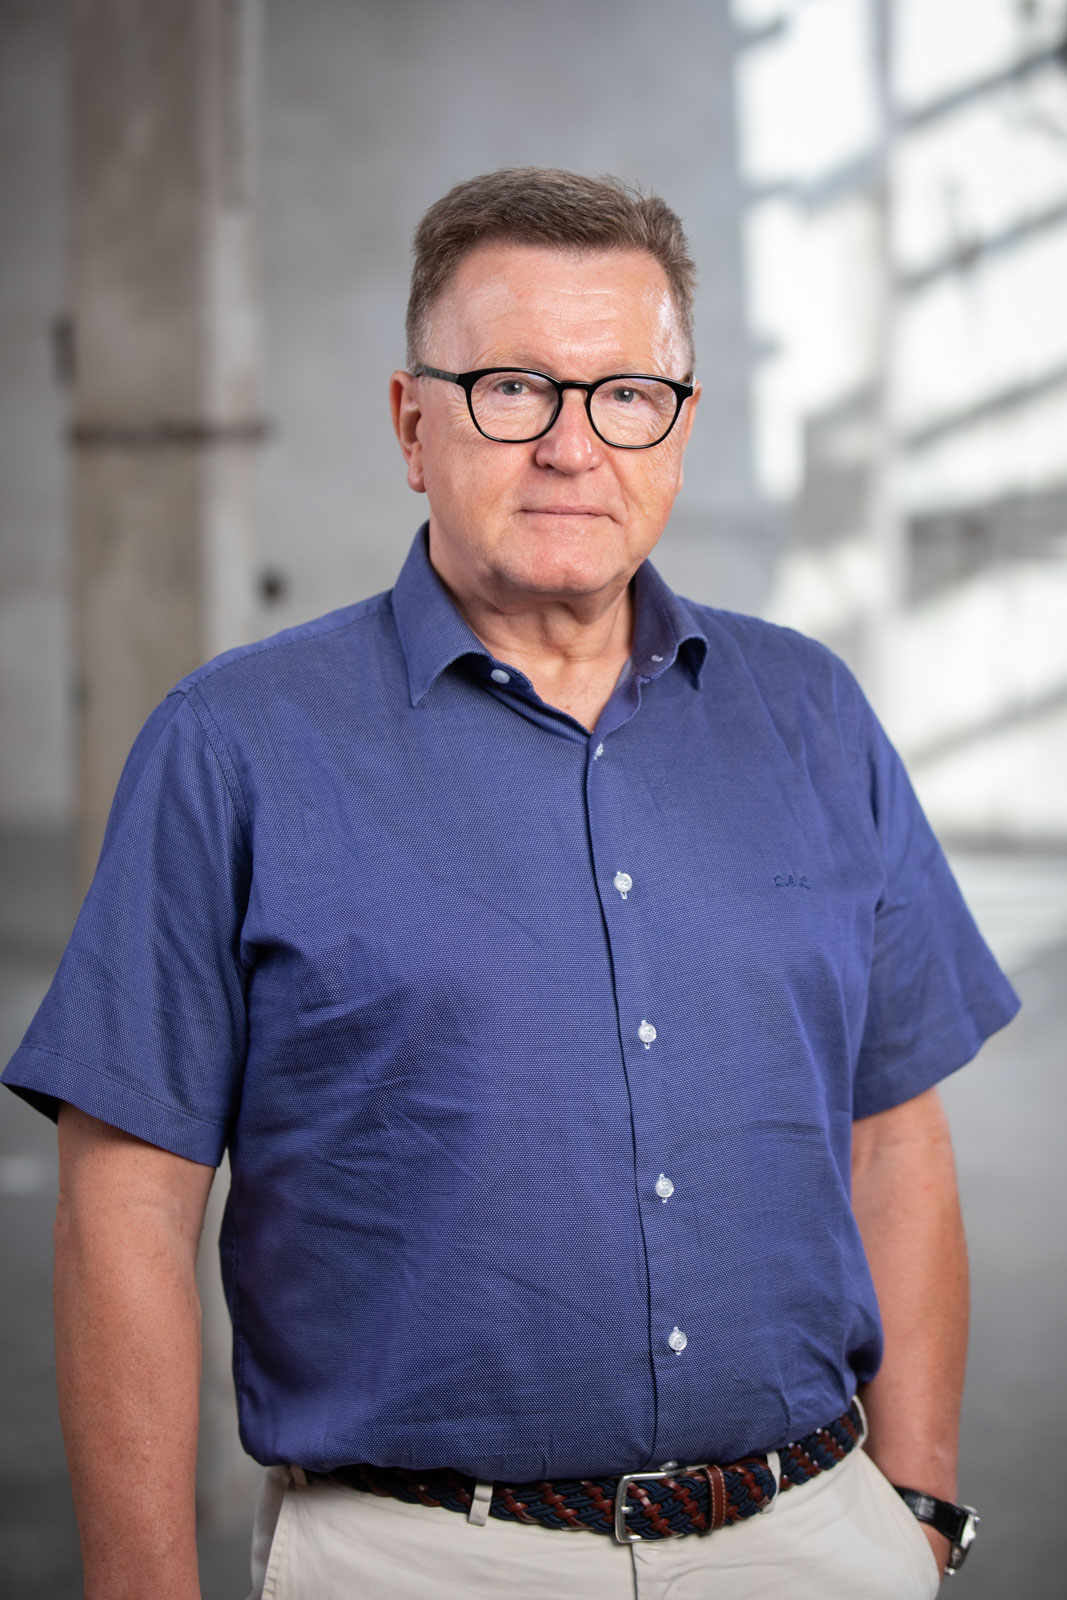 Claus Astrup-Larsen